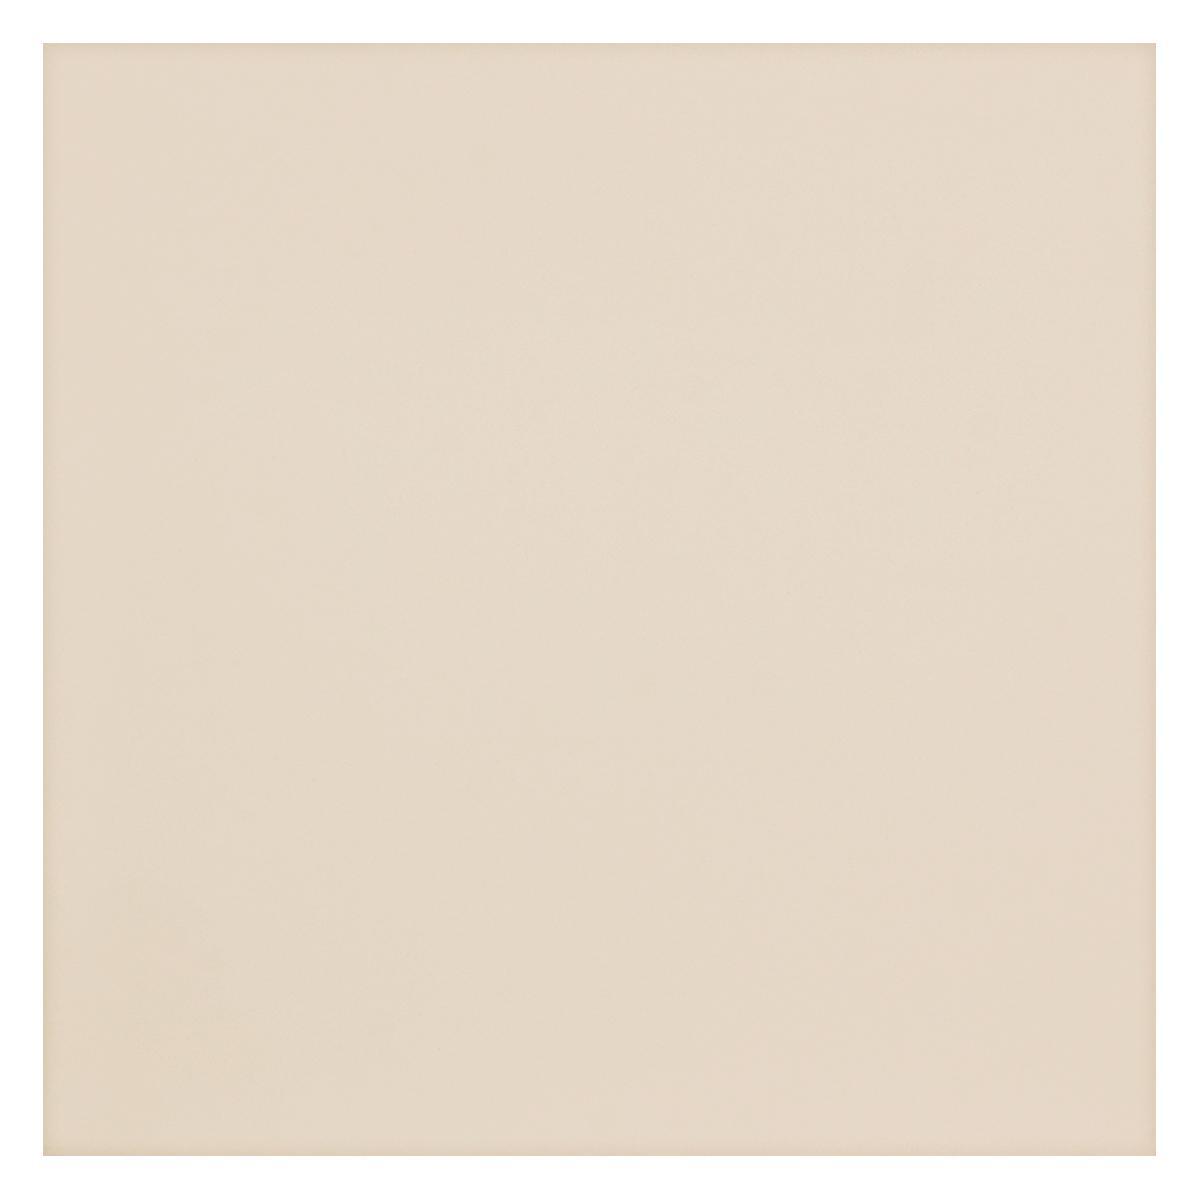 Porcelanato Unicolor Blanco Brillante - 60X60 cm - 1.44 m2